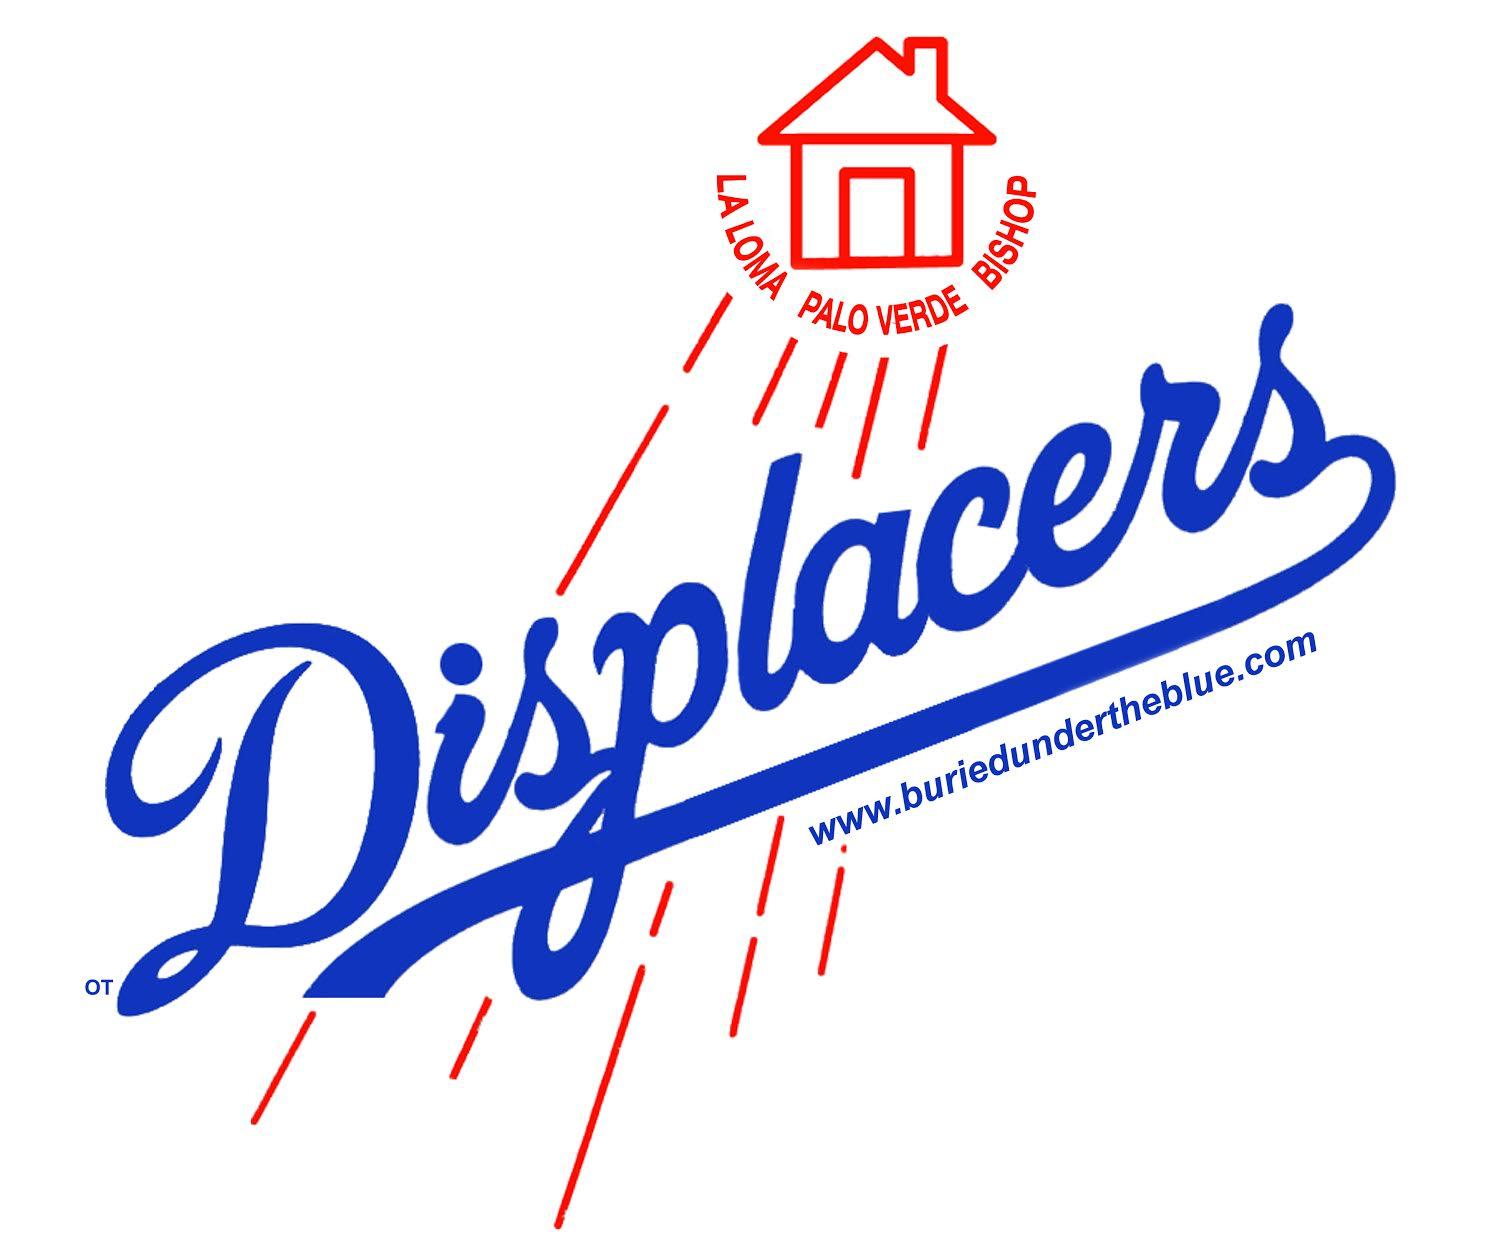 Displacers